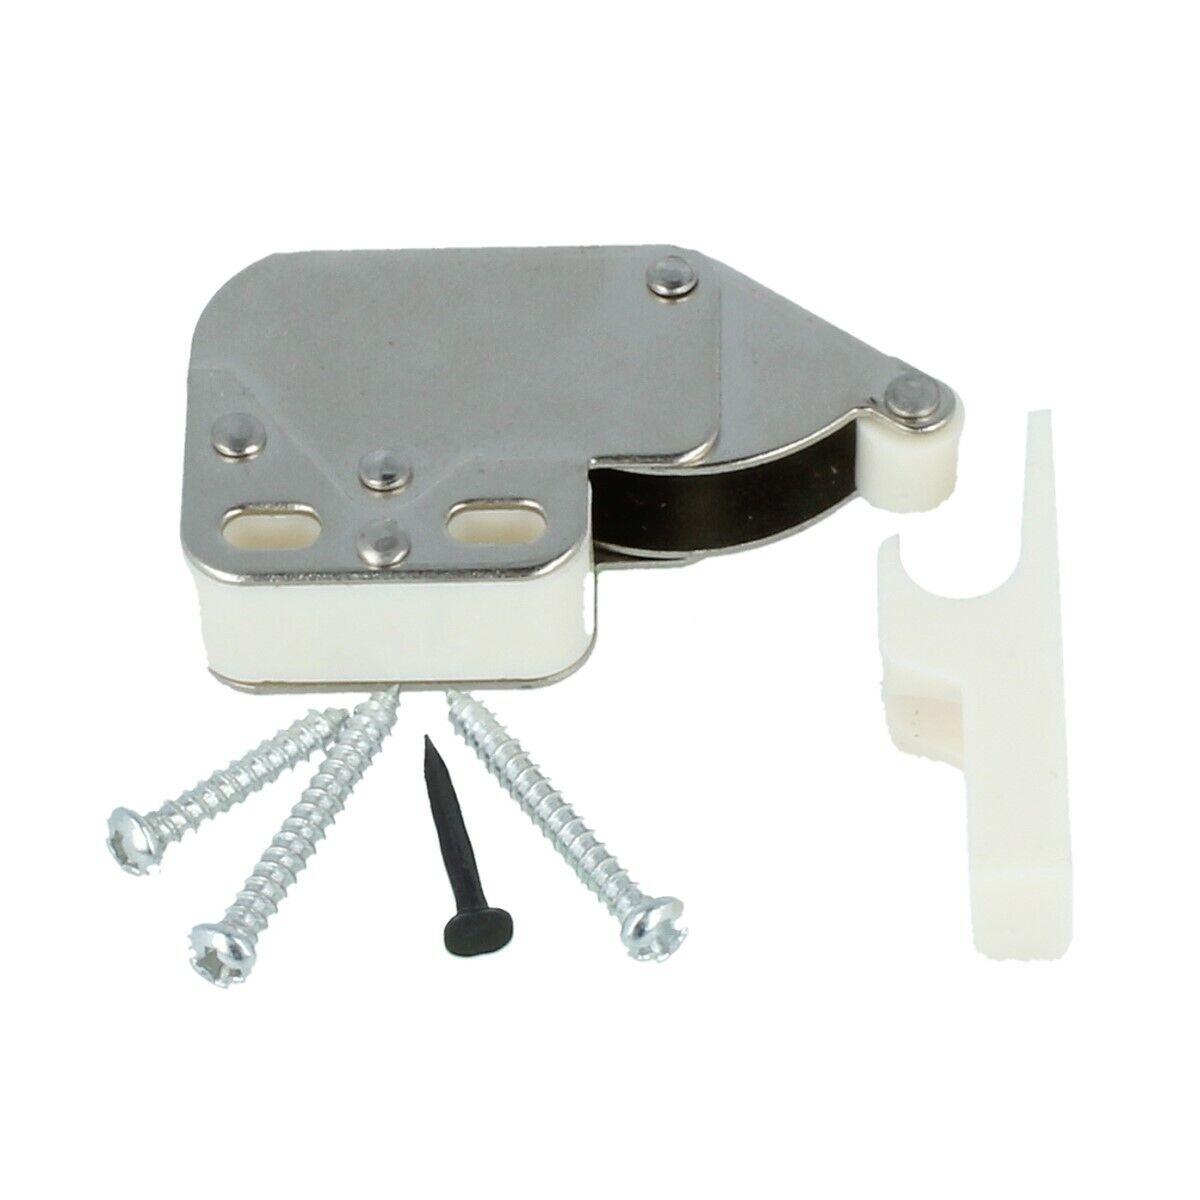 Automatik Federschnäpper Mini-Latch Druckverschluß Federschnappverschluß 8720